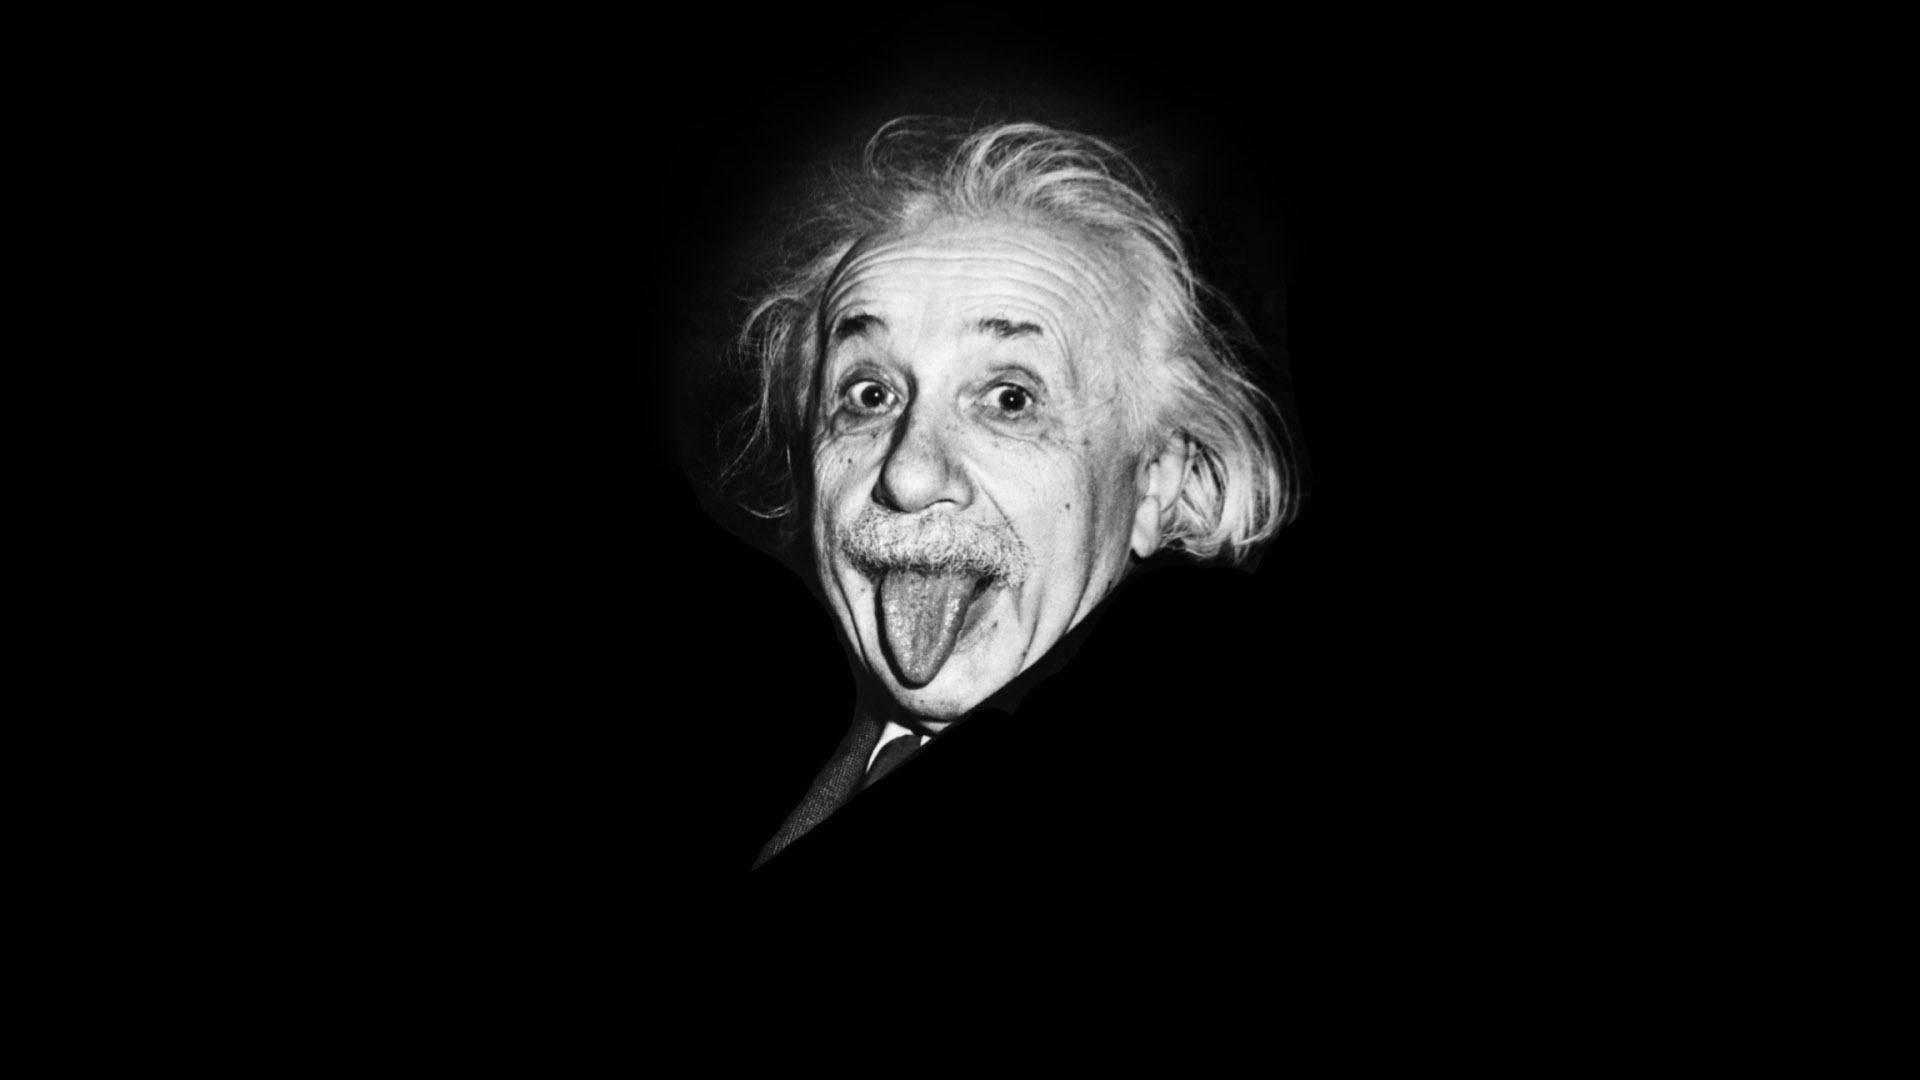 Quotes Hd Wallpapers 1080p For Mobile Albert Einstein Hd Wallpaper Pixelstalk Net